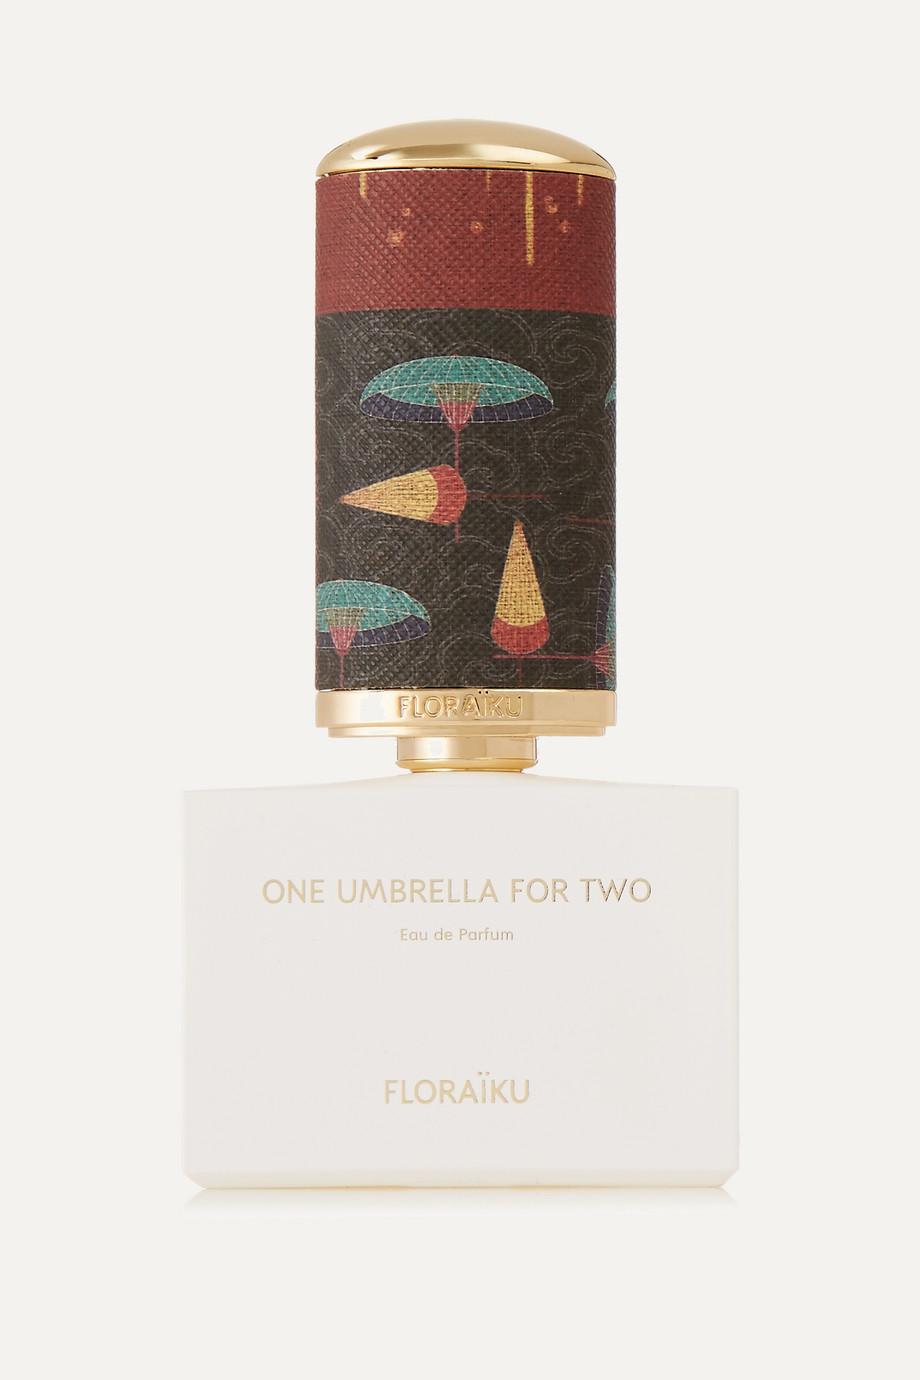 Floraiku One Umbrella For Two Eau de Parfum, 50ml & 10ml